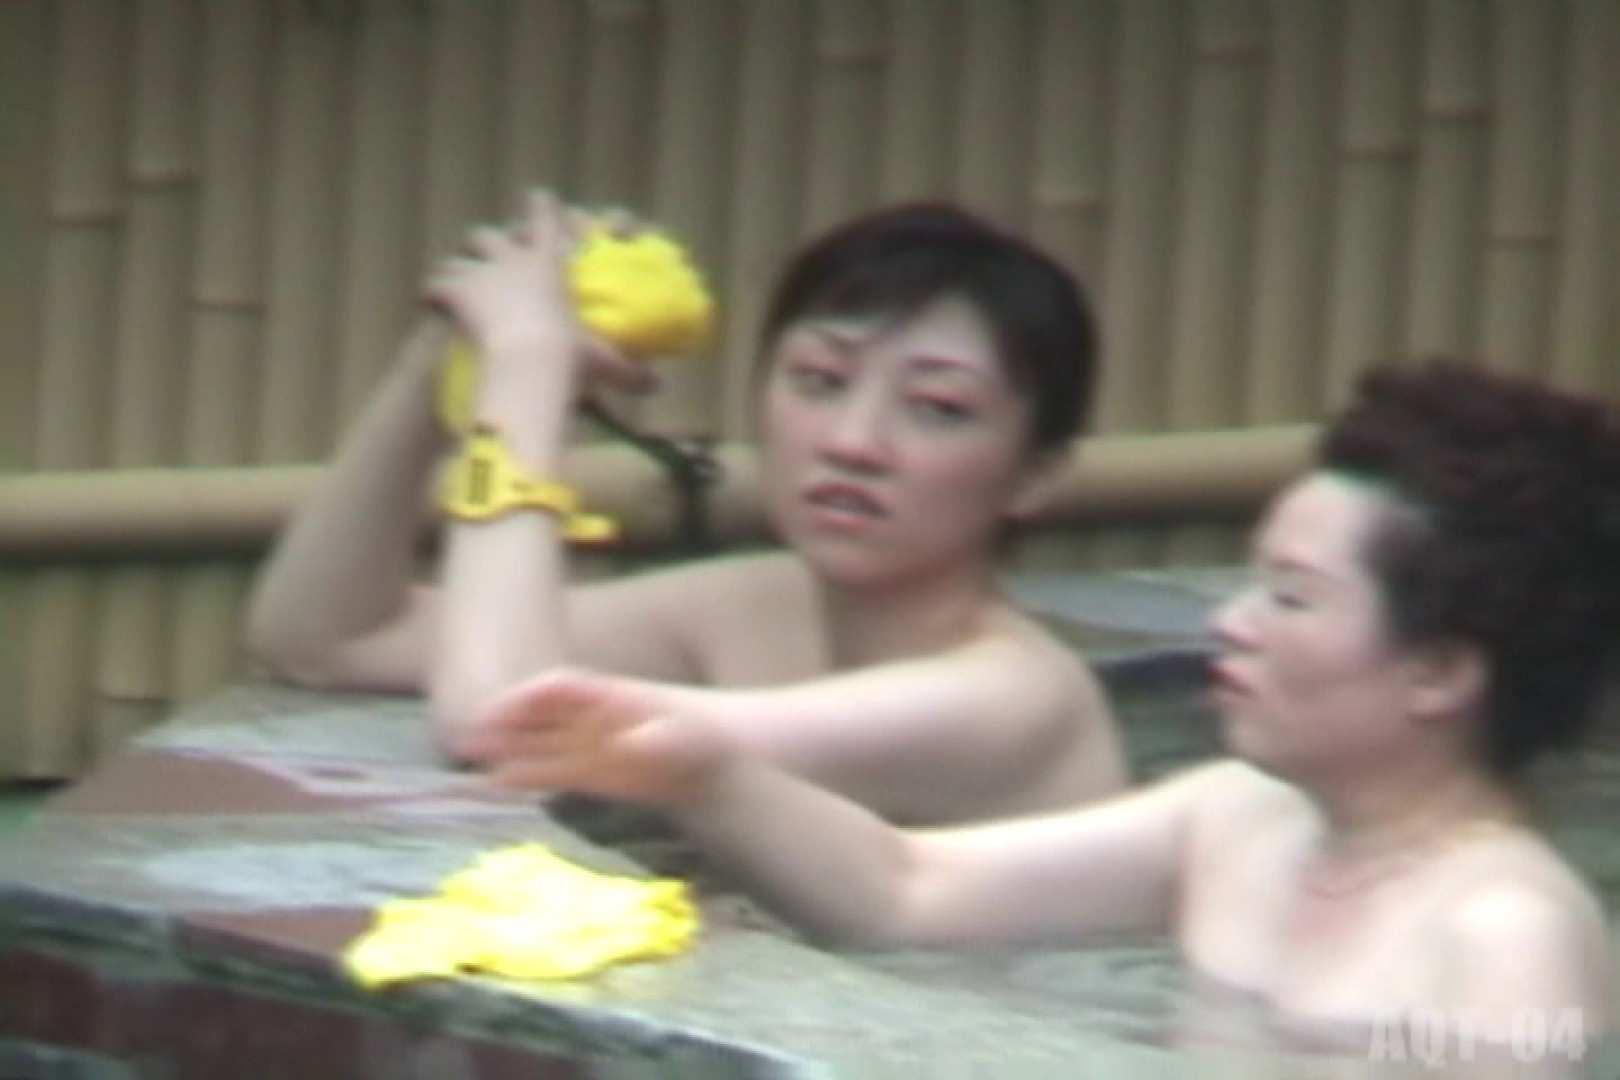 Aquaな露天風呂Vol.743 盗撮師作品 オマンコ無修正動画無料 91pic 14